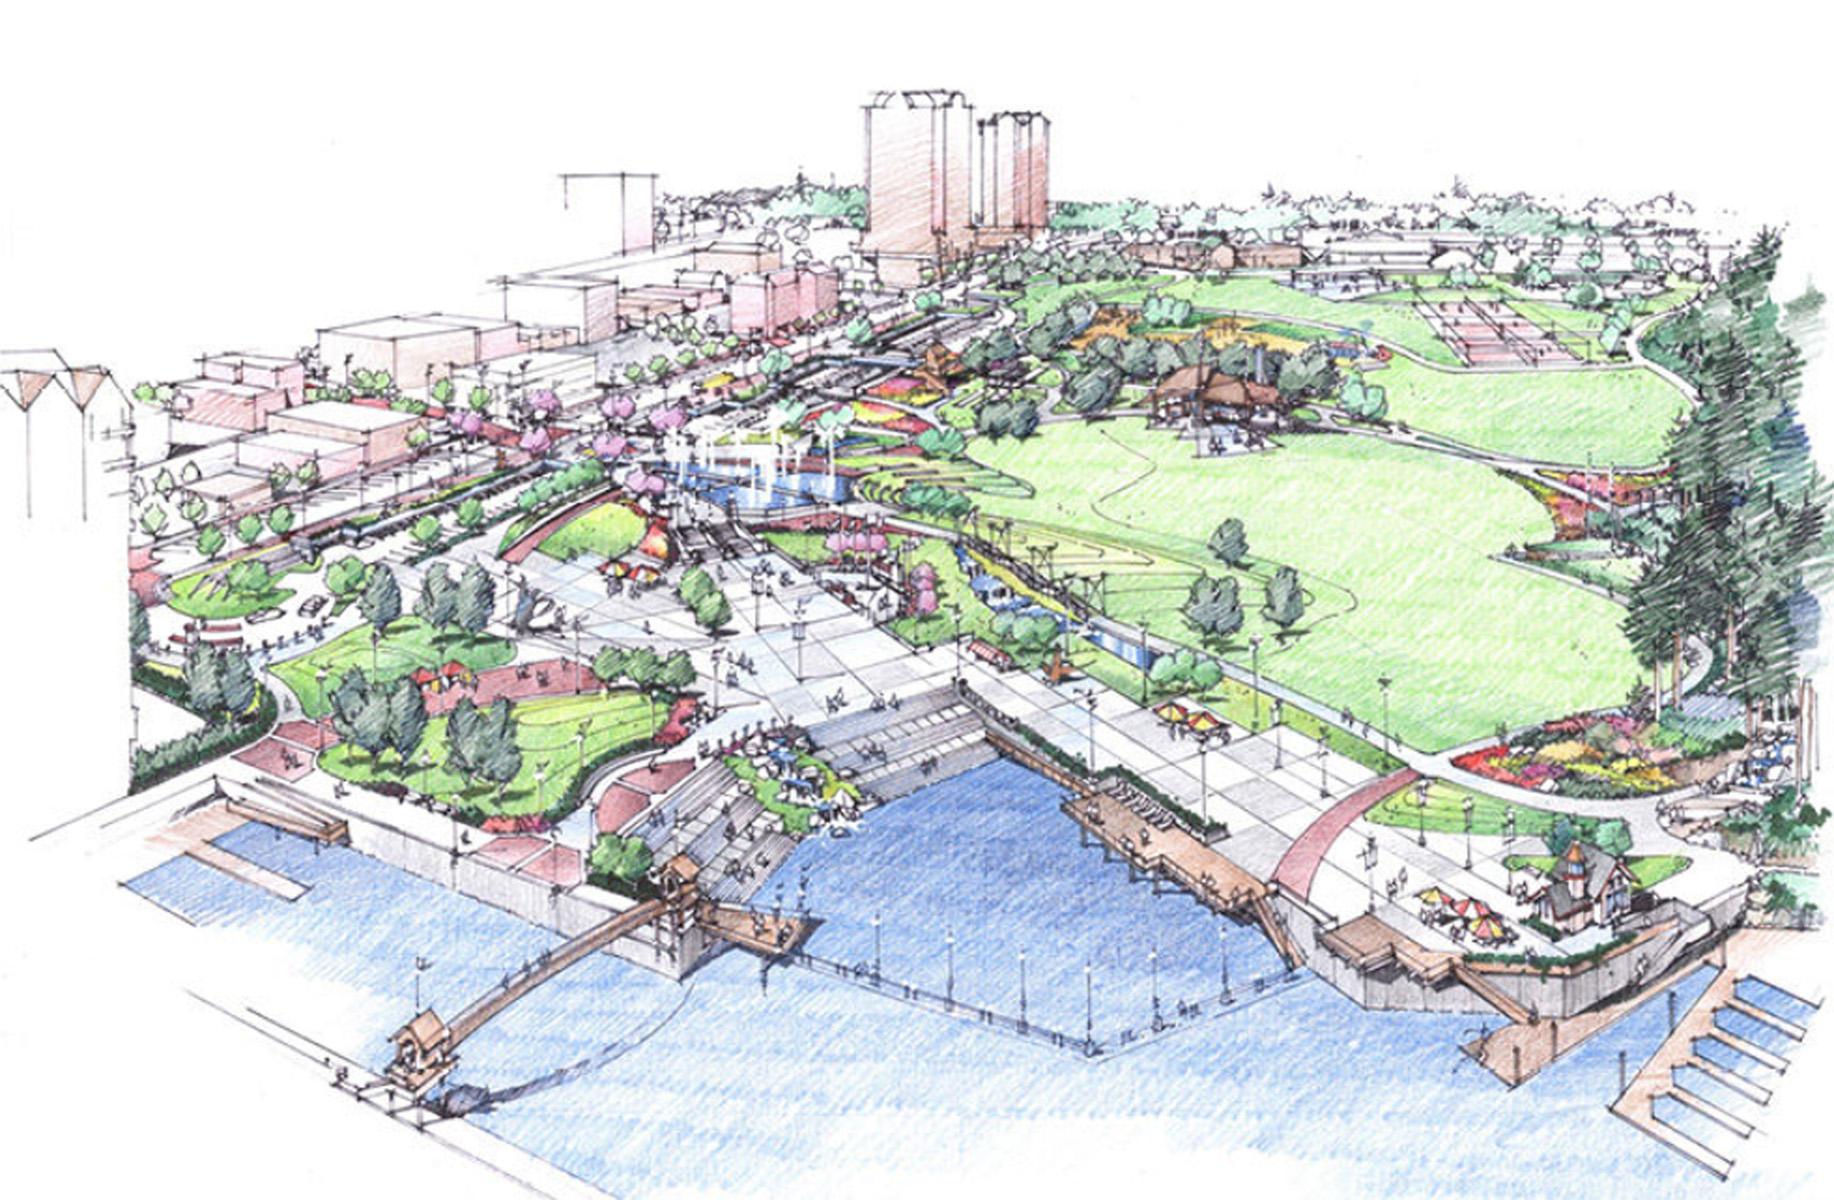 McEuen Park Redevelopment - General Design Category. - BWA Landscape Architecture